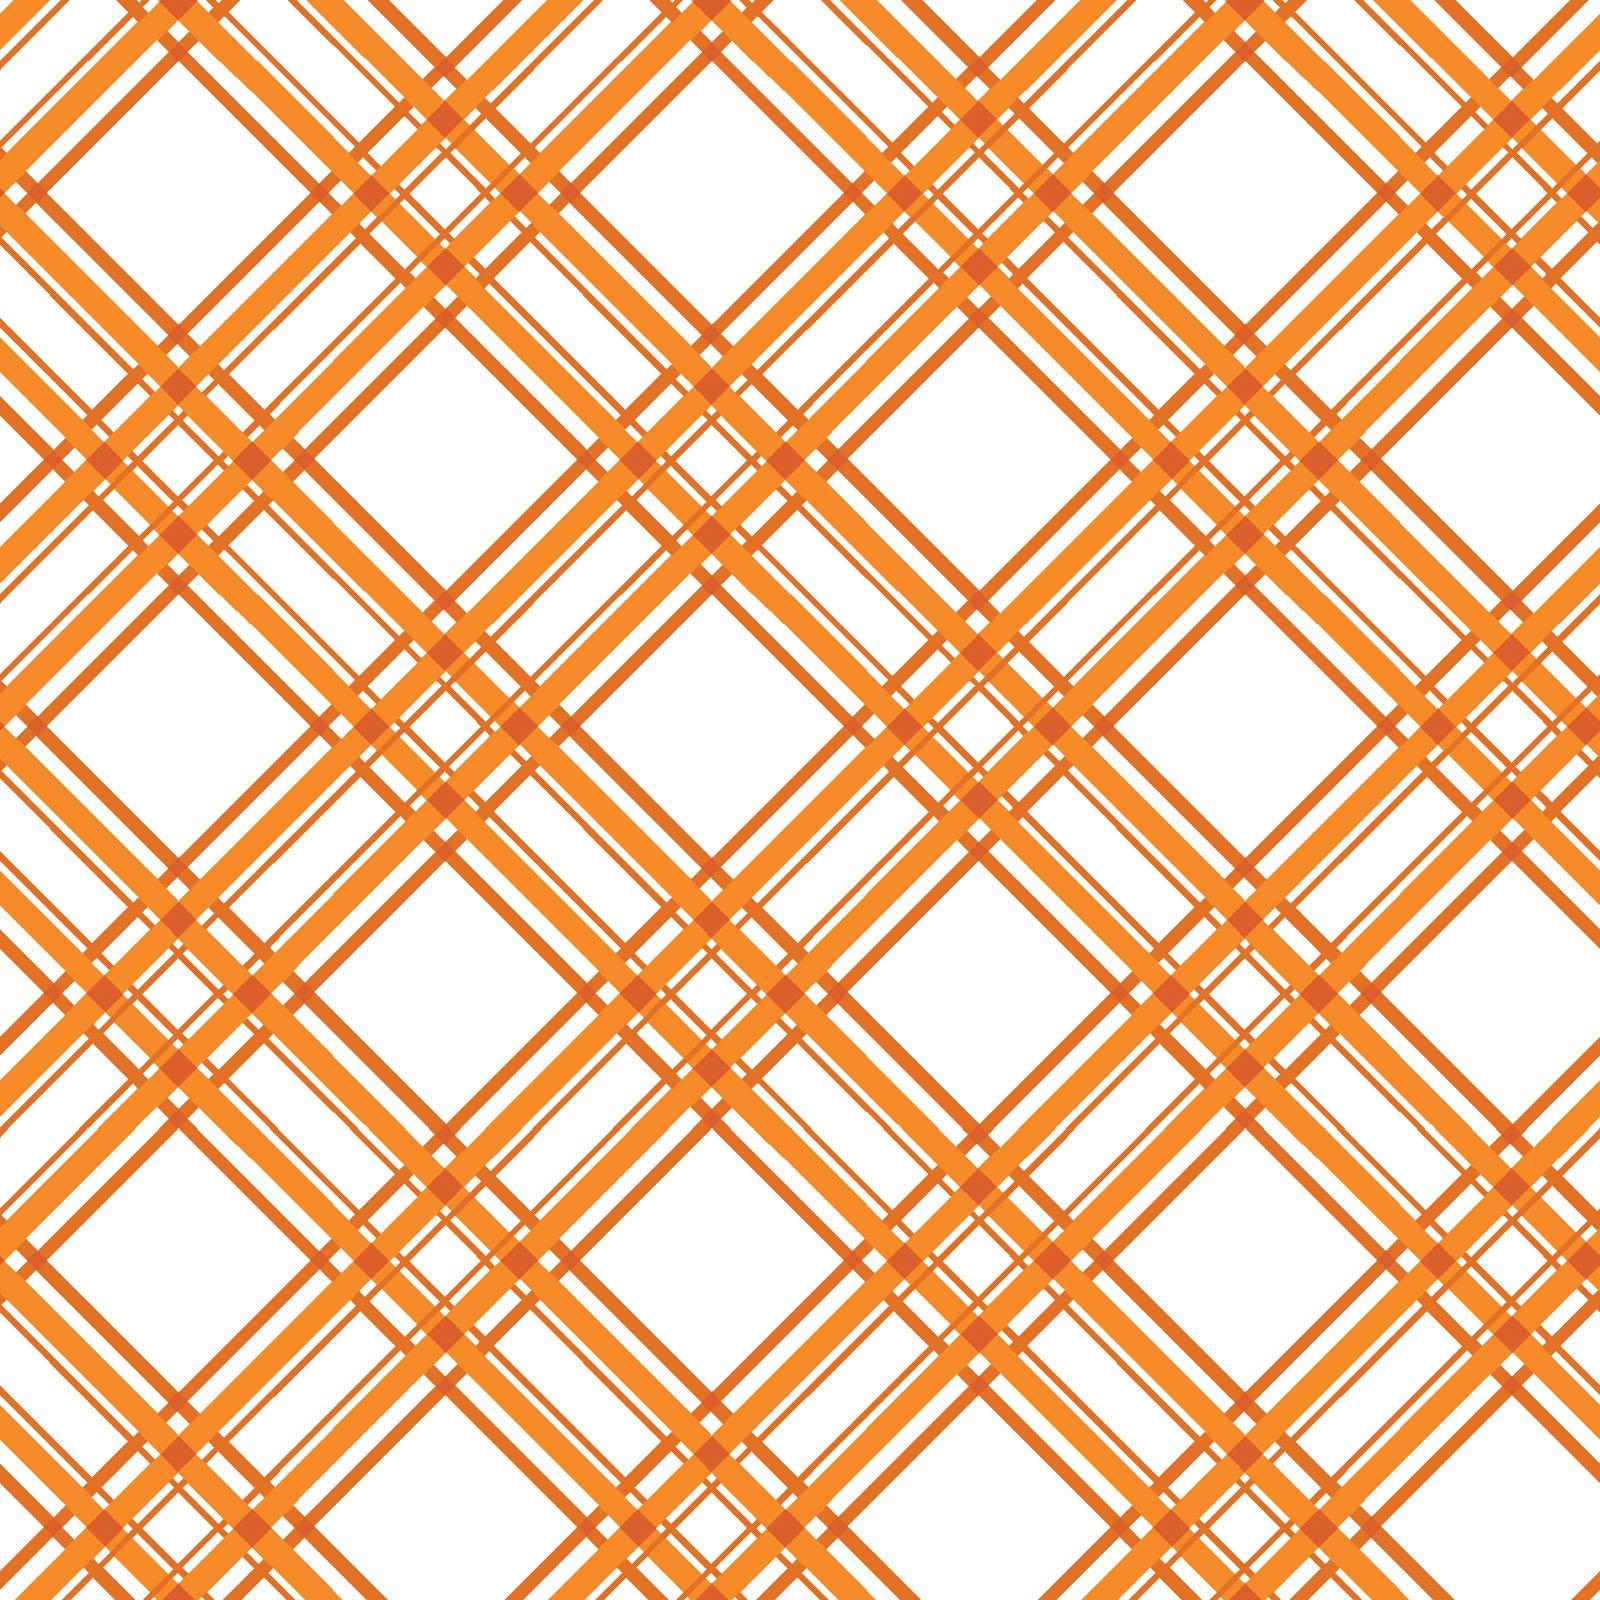 KimberBell Basics Orange Diagonal Plaid 8244M-O